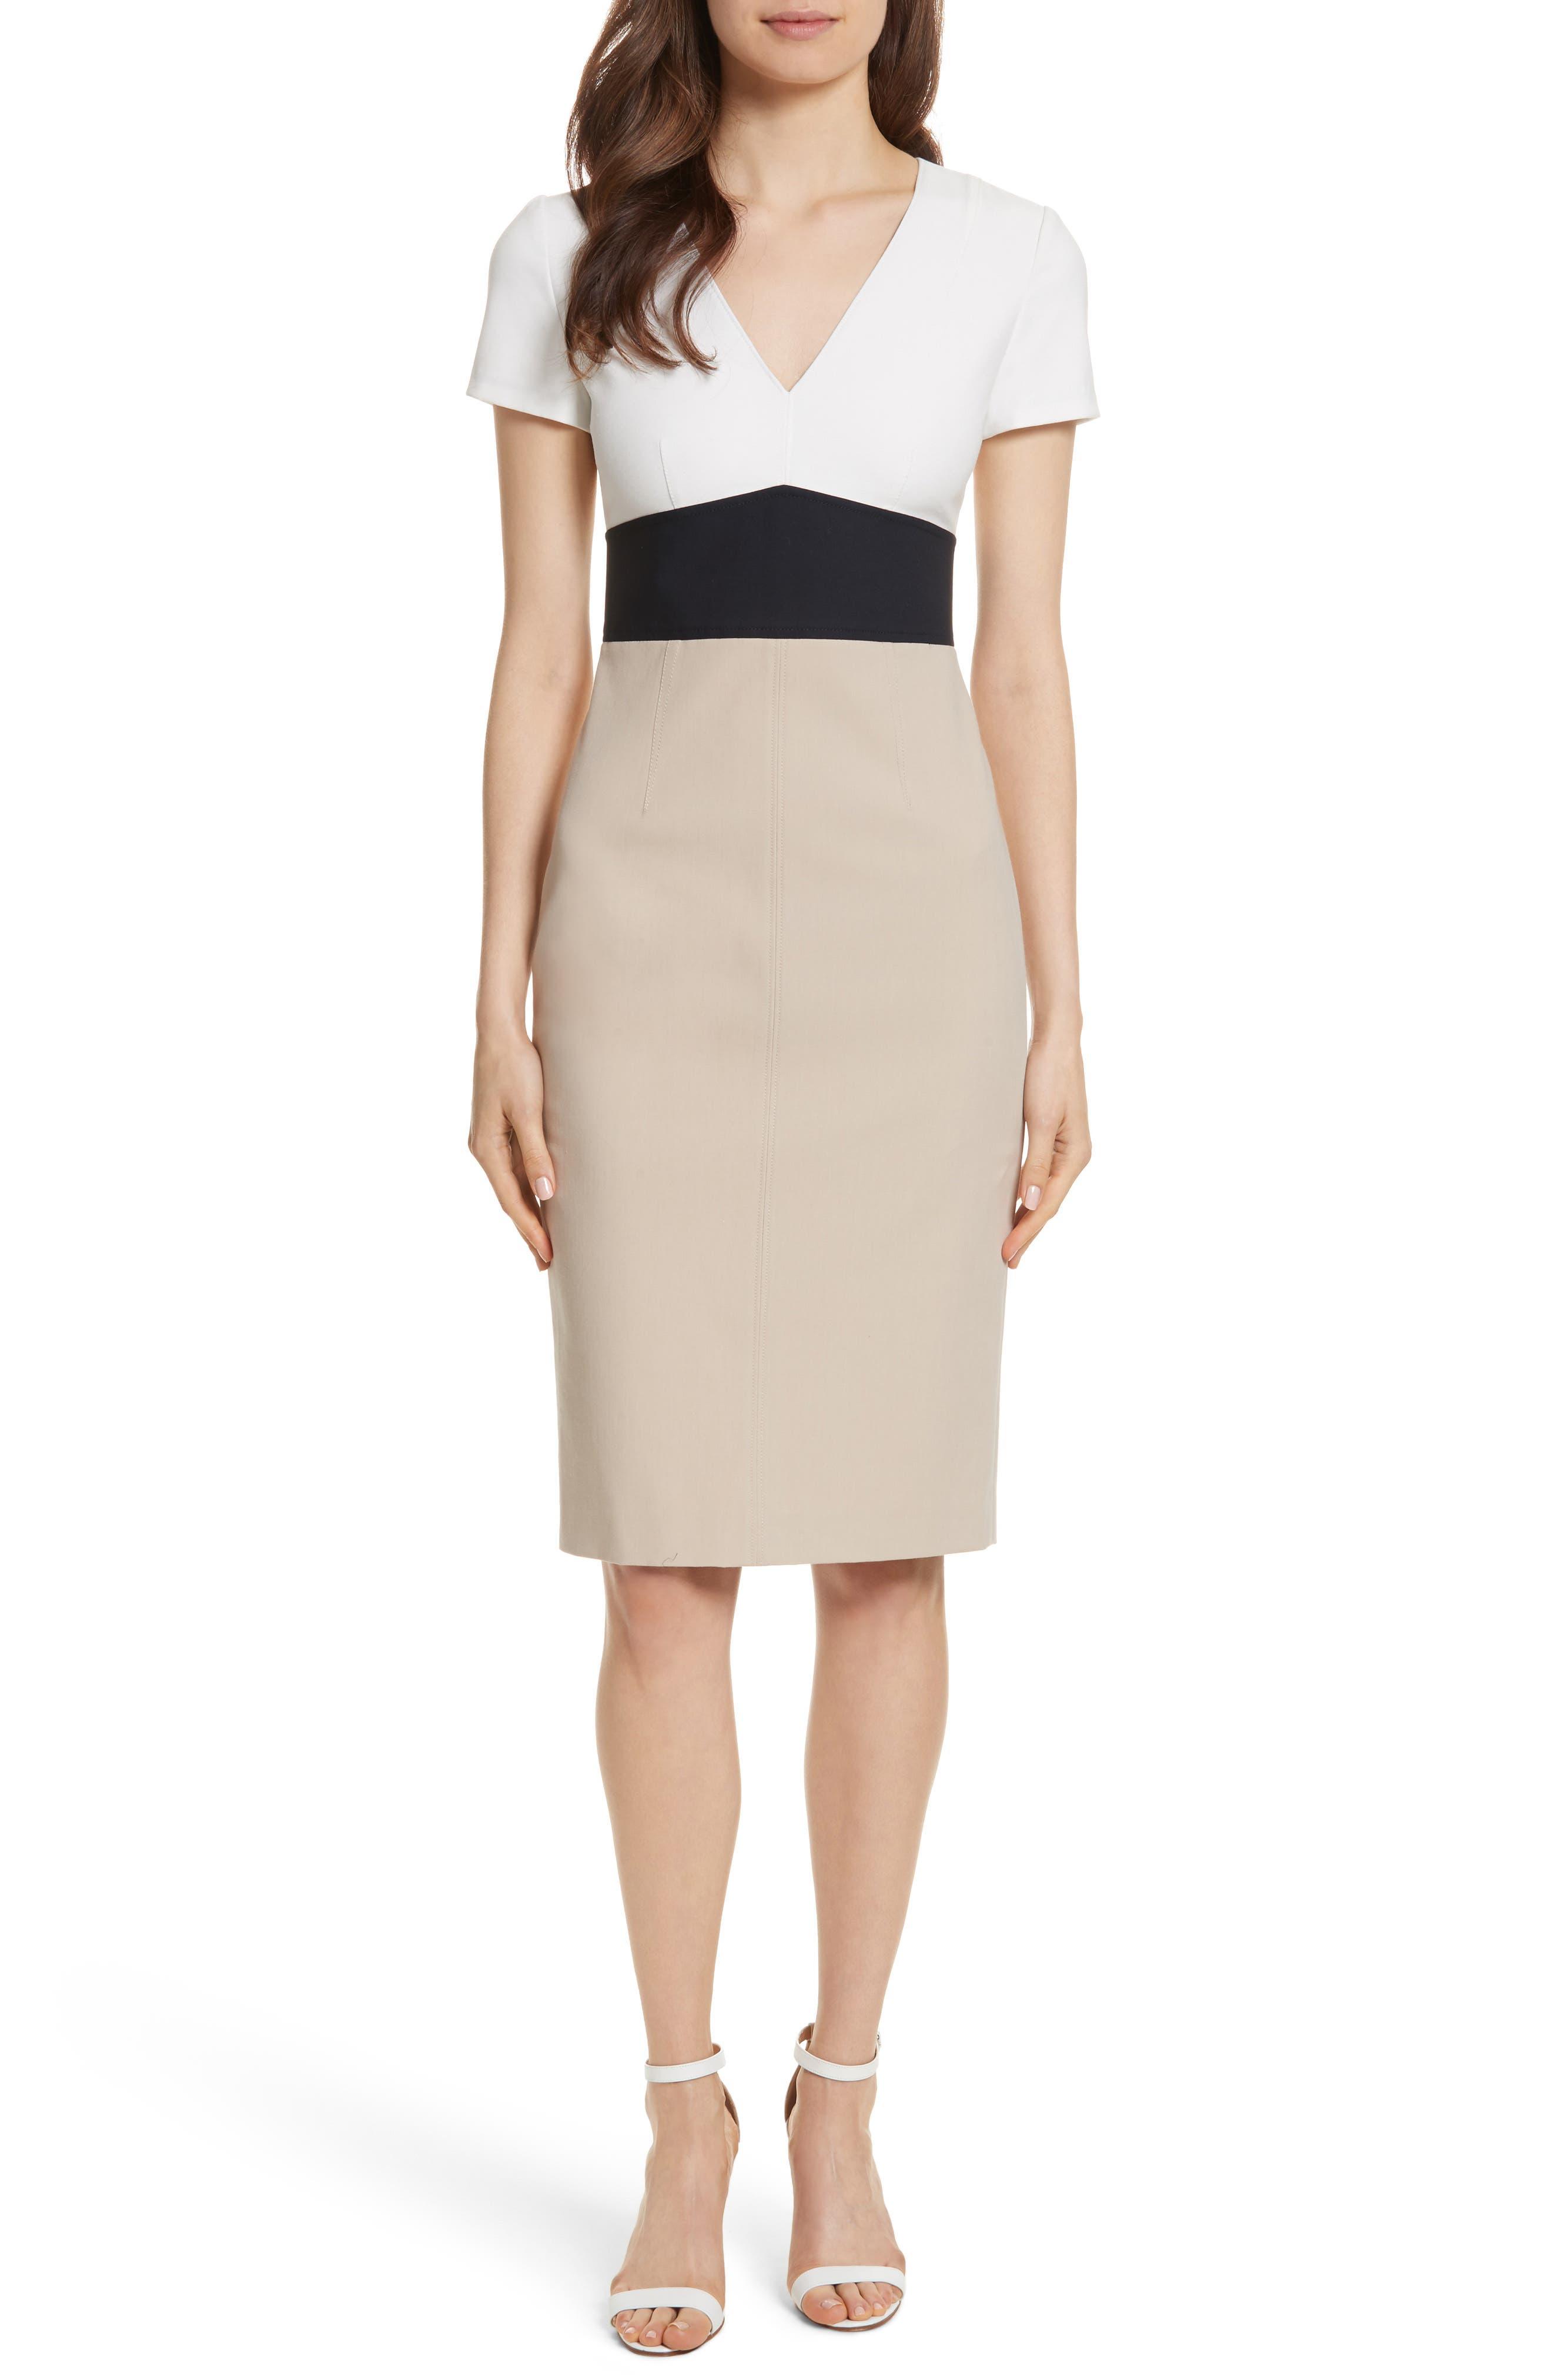 Diane von Furstenberg Colorblock Stretch Cotton Blend Sheath Dress,                         Main,                         color,